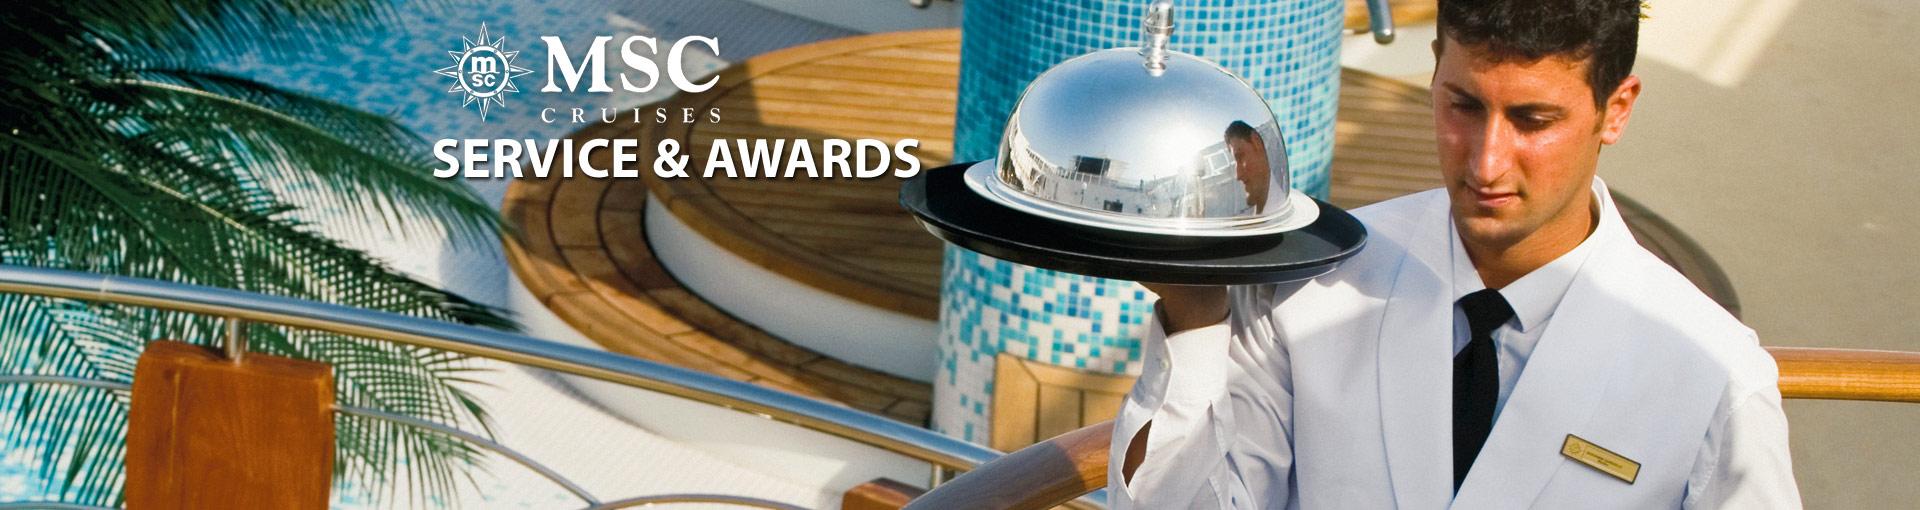 MSC Cruises Services & Awards